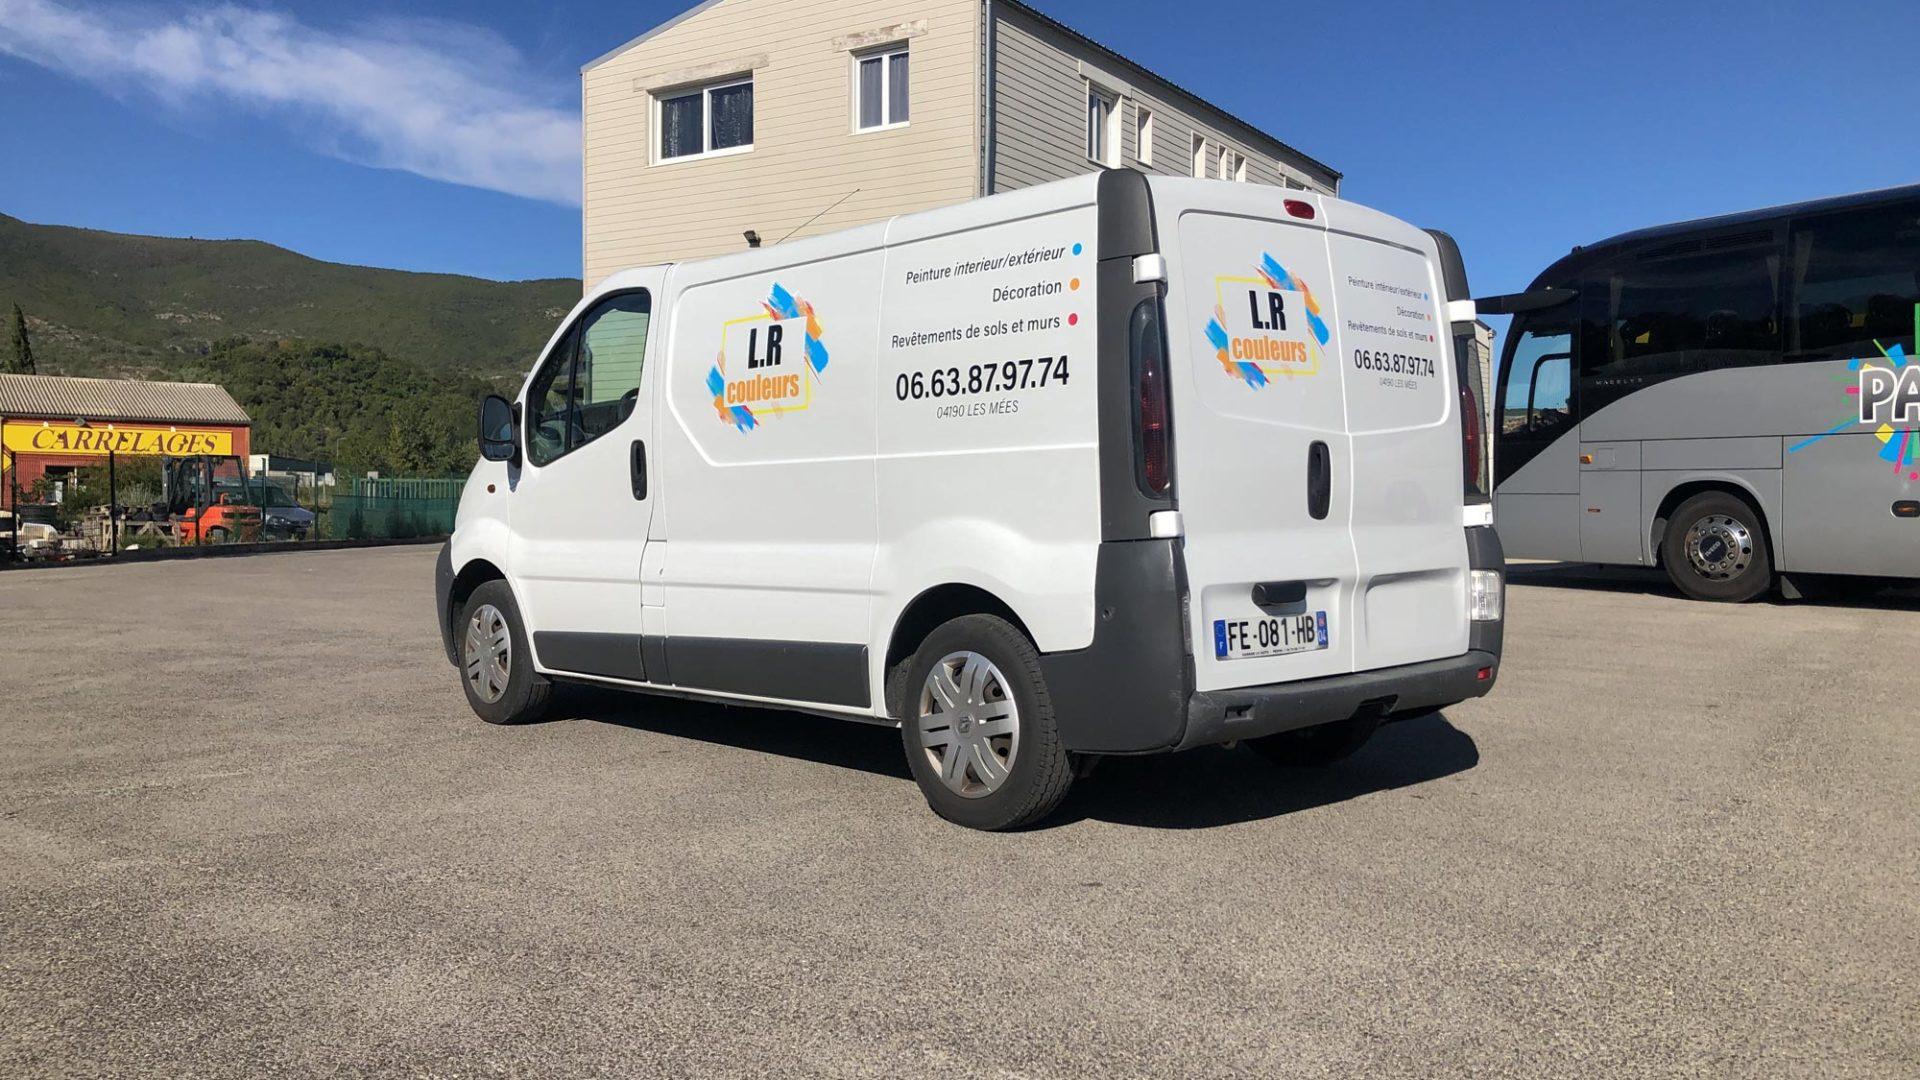 Renault Trafic LR Peinture Agence 2219